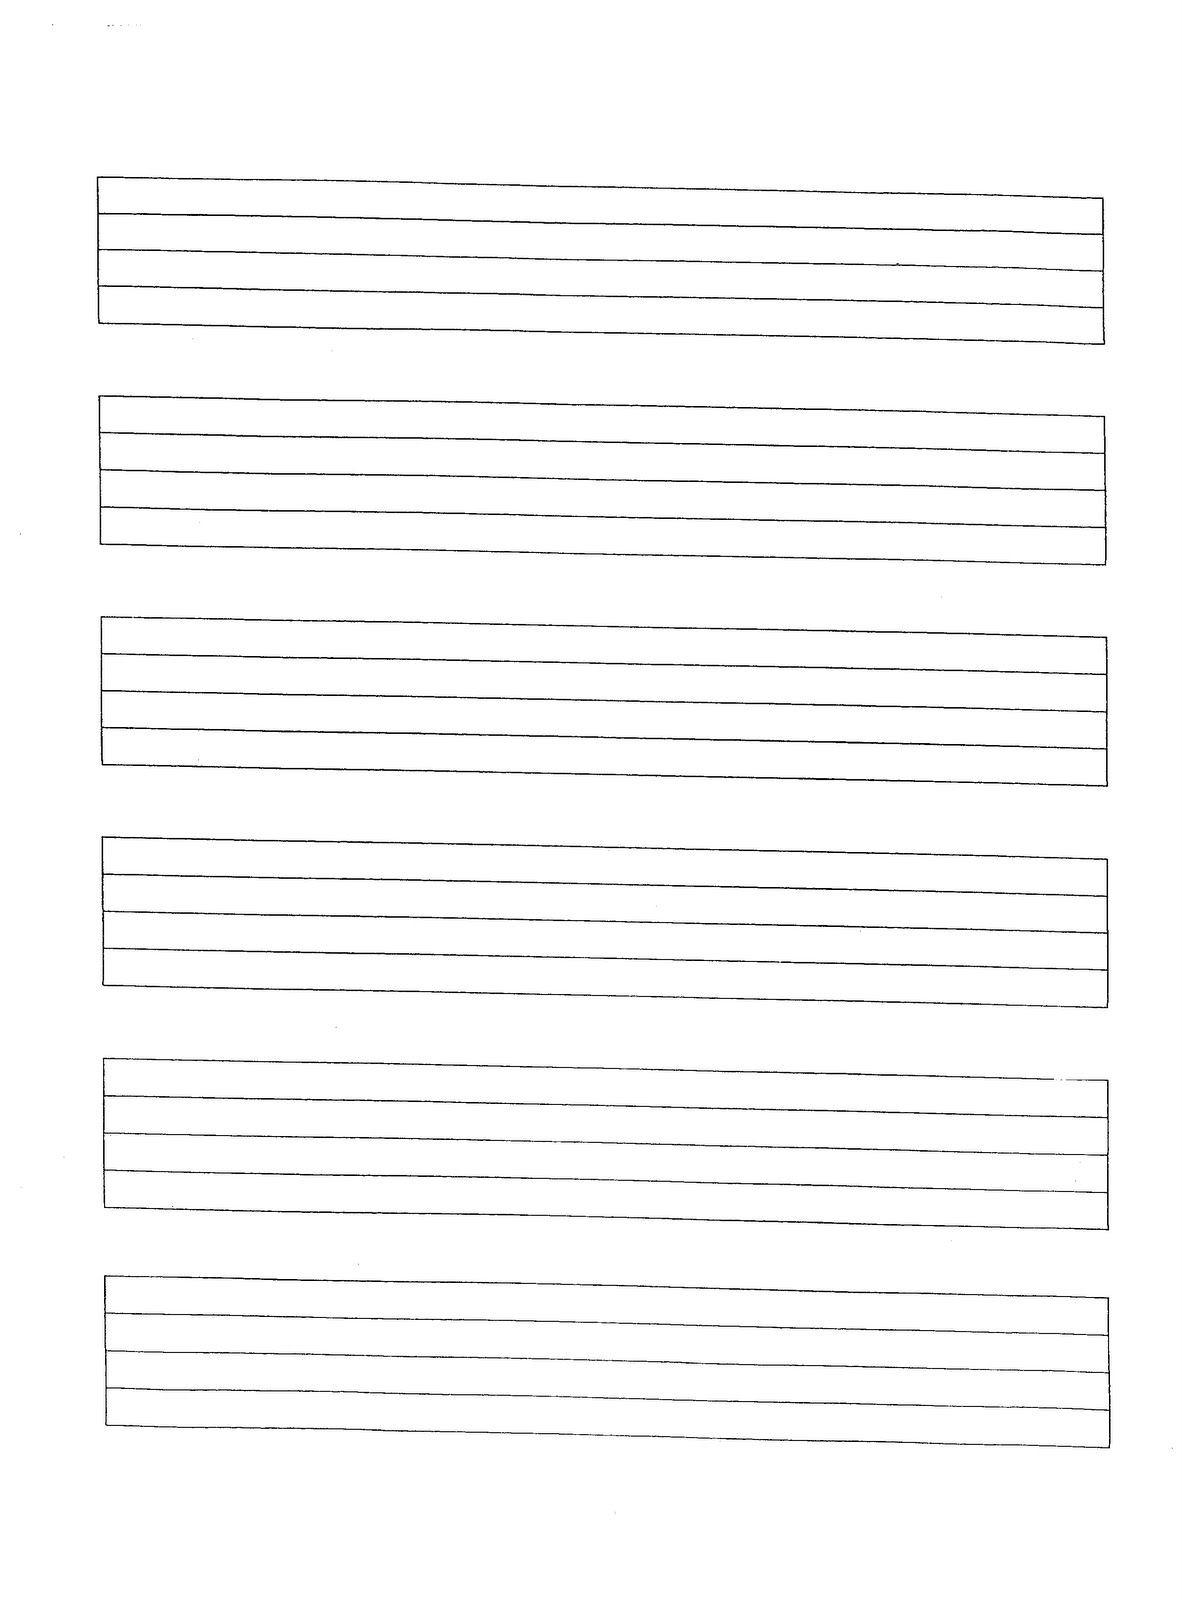 Music Manuscript Paper Free Printable | Sites Where You Can Find | Manuscript Printable Worksheets